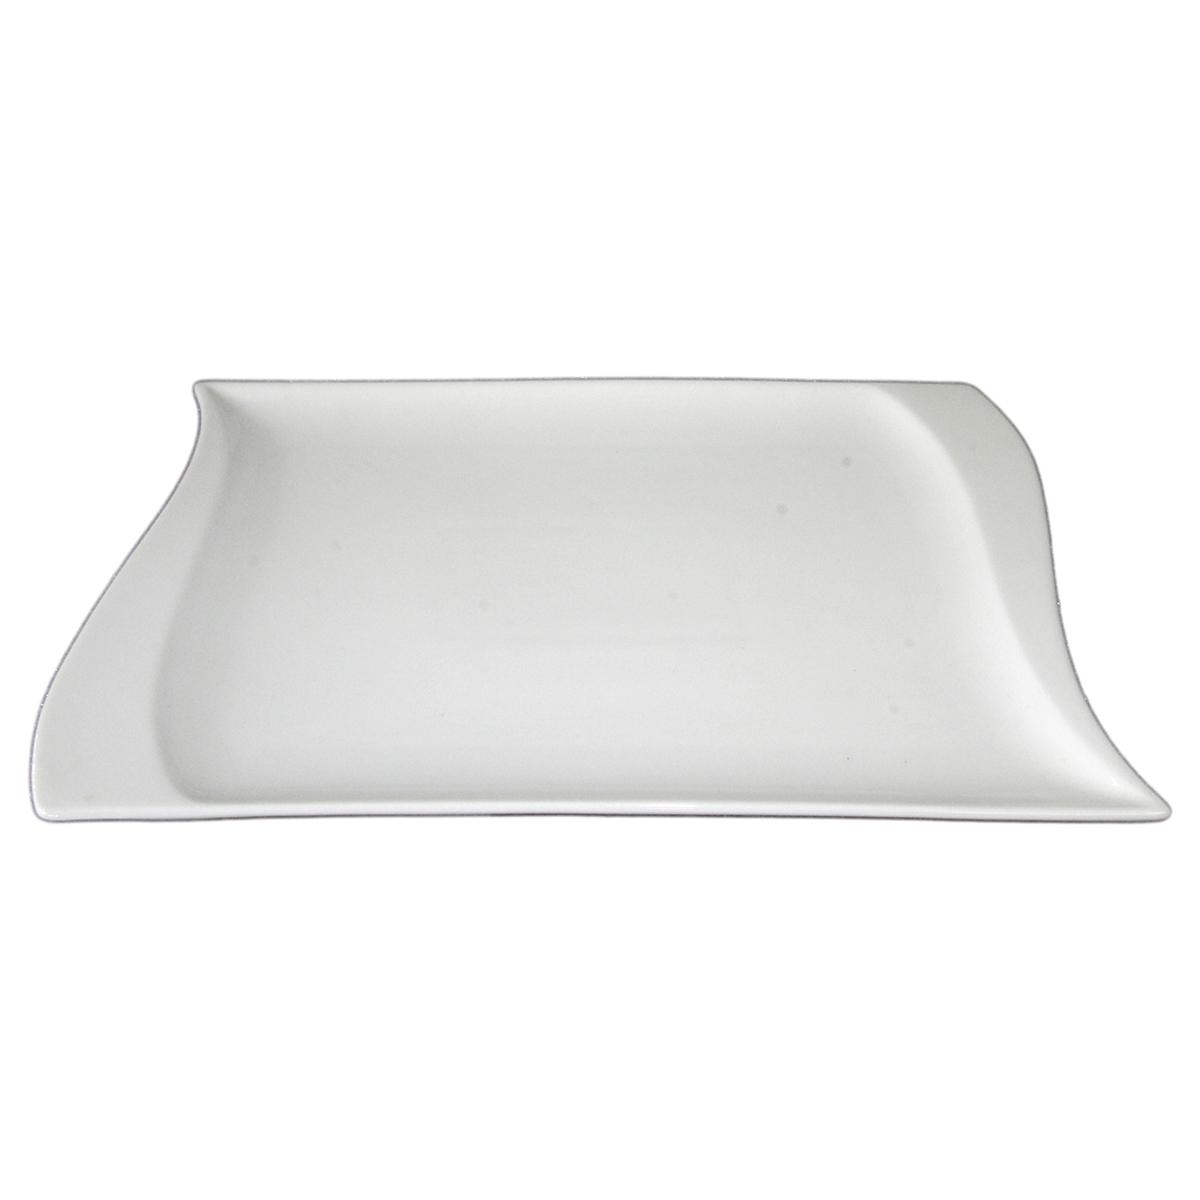 Travessa porcelana retangular branca 31x20cm Bon Gourmet